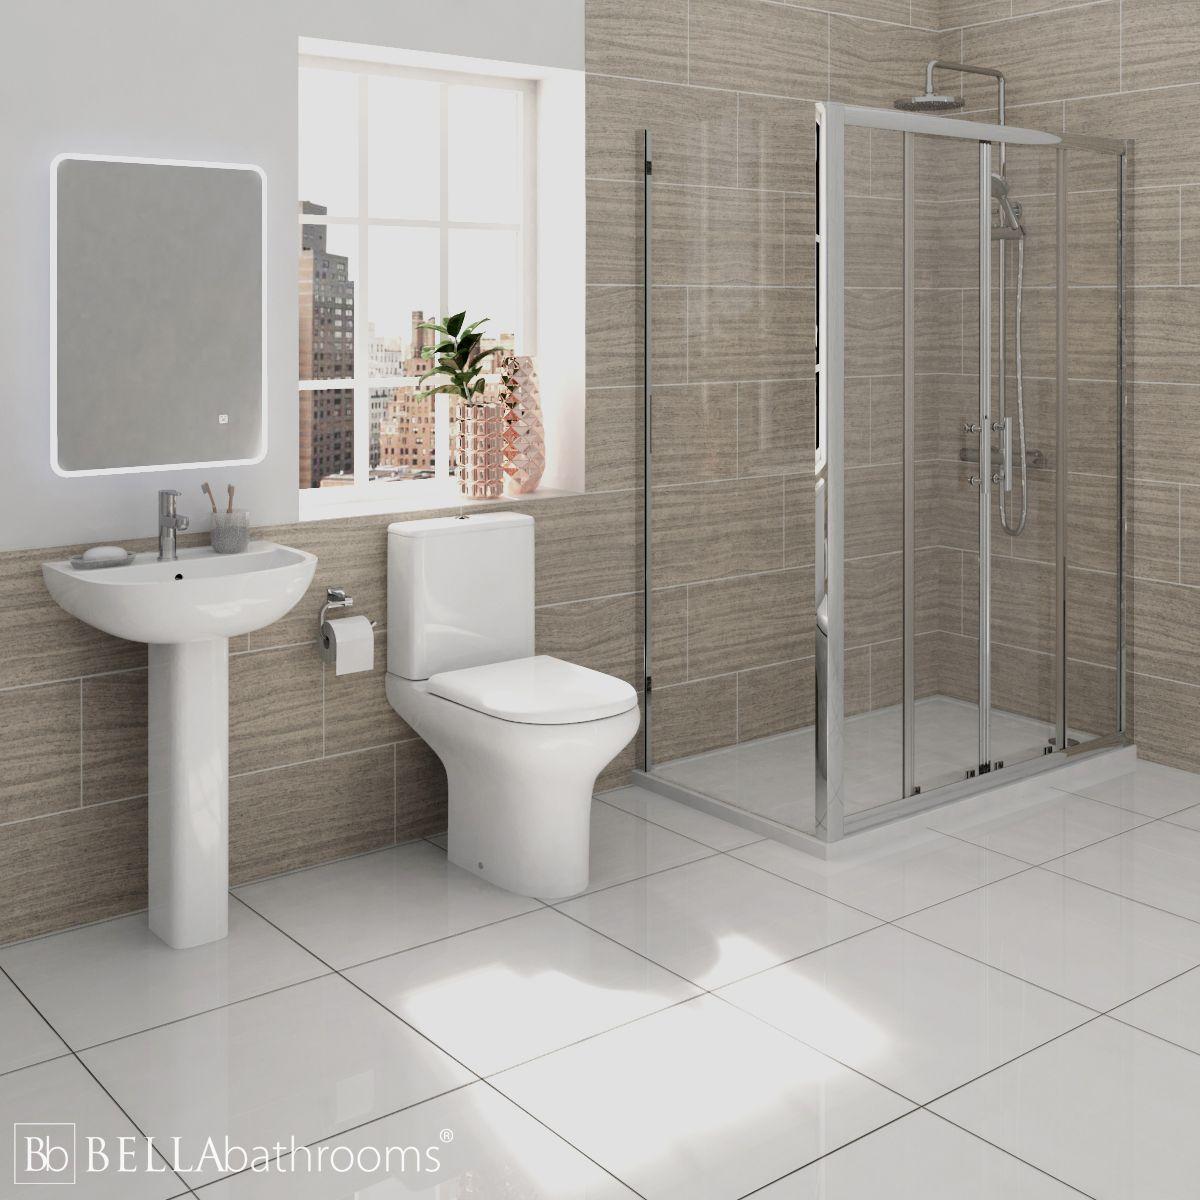 RAK Compact Shower Suite with Pacific Double Sliding Door Shower Enclosure